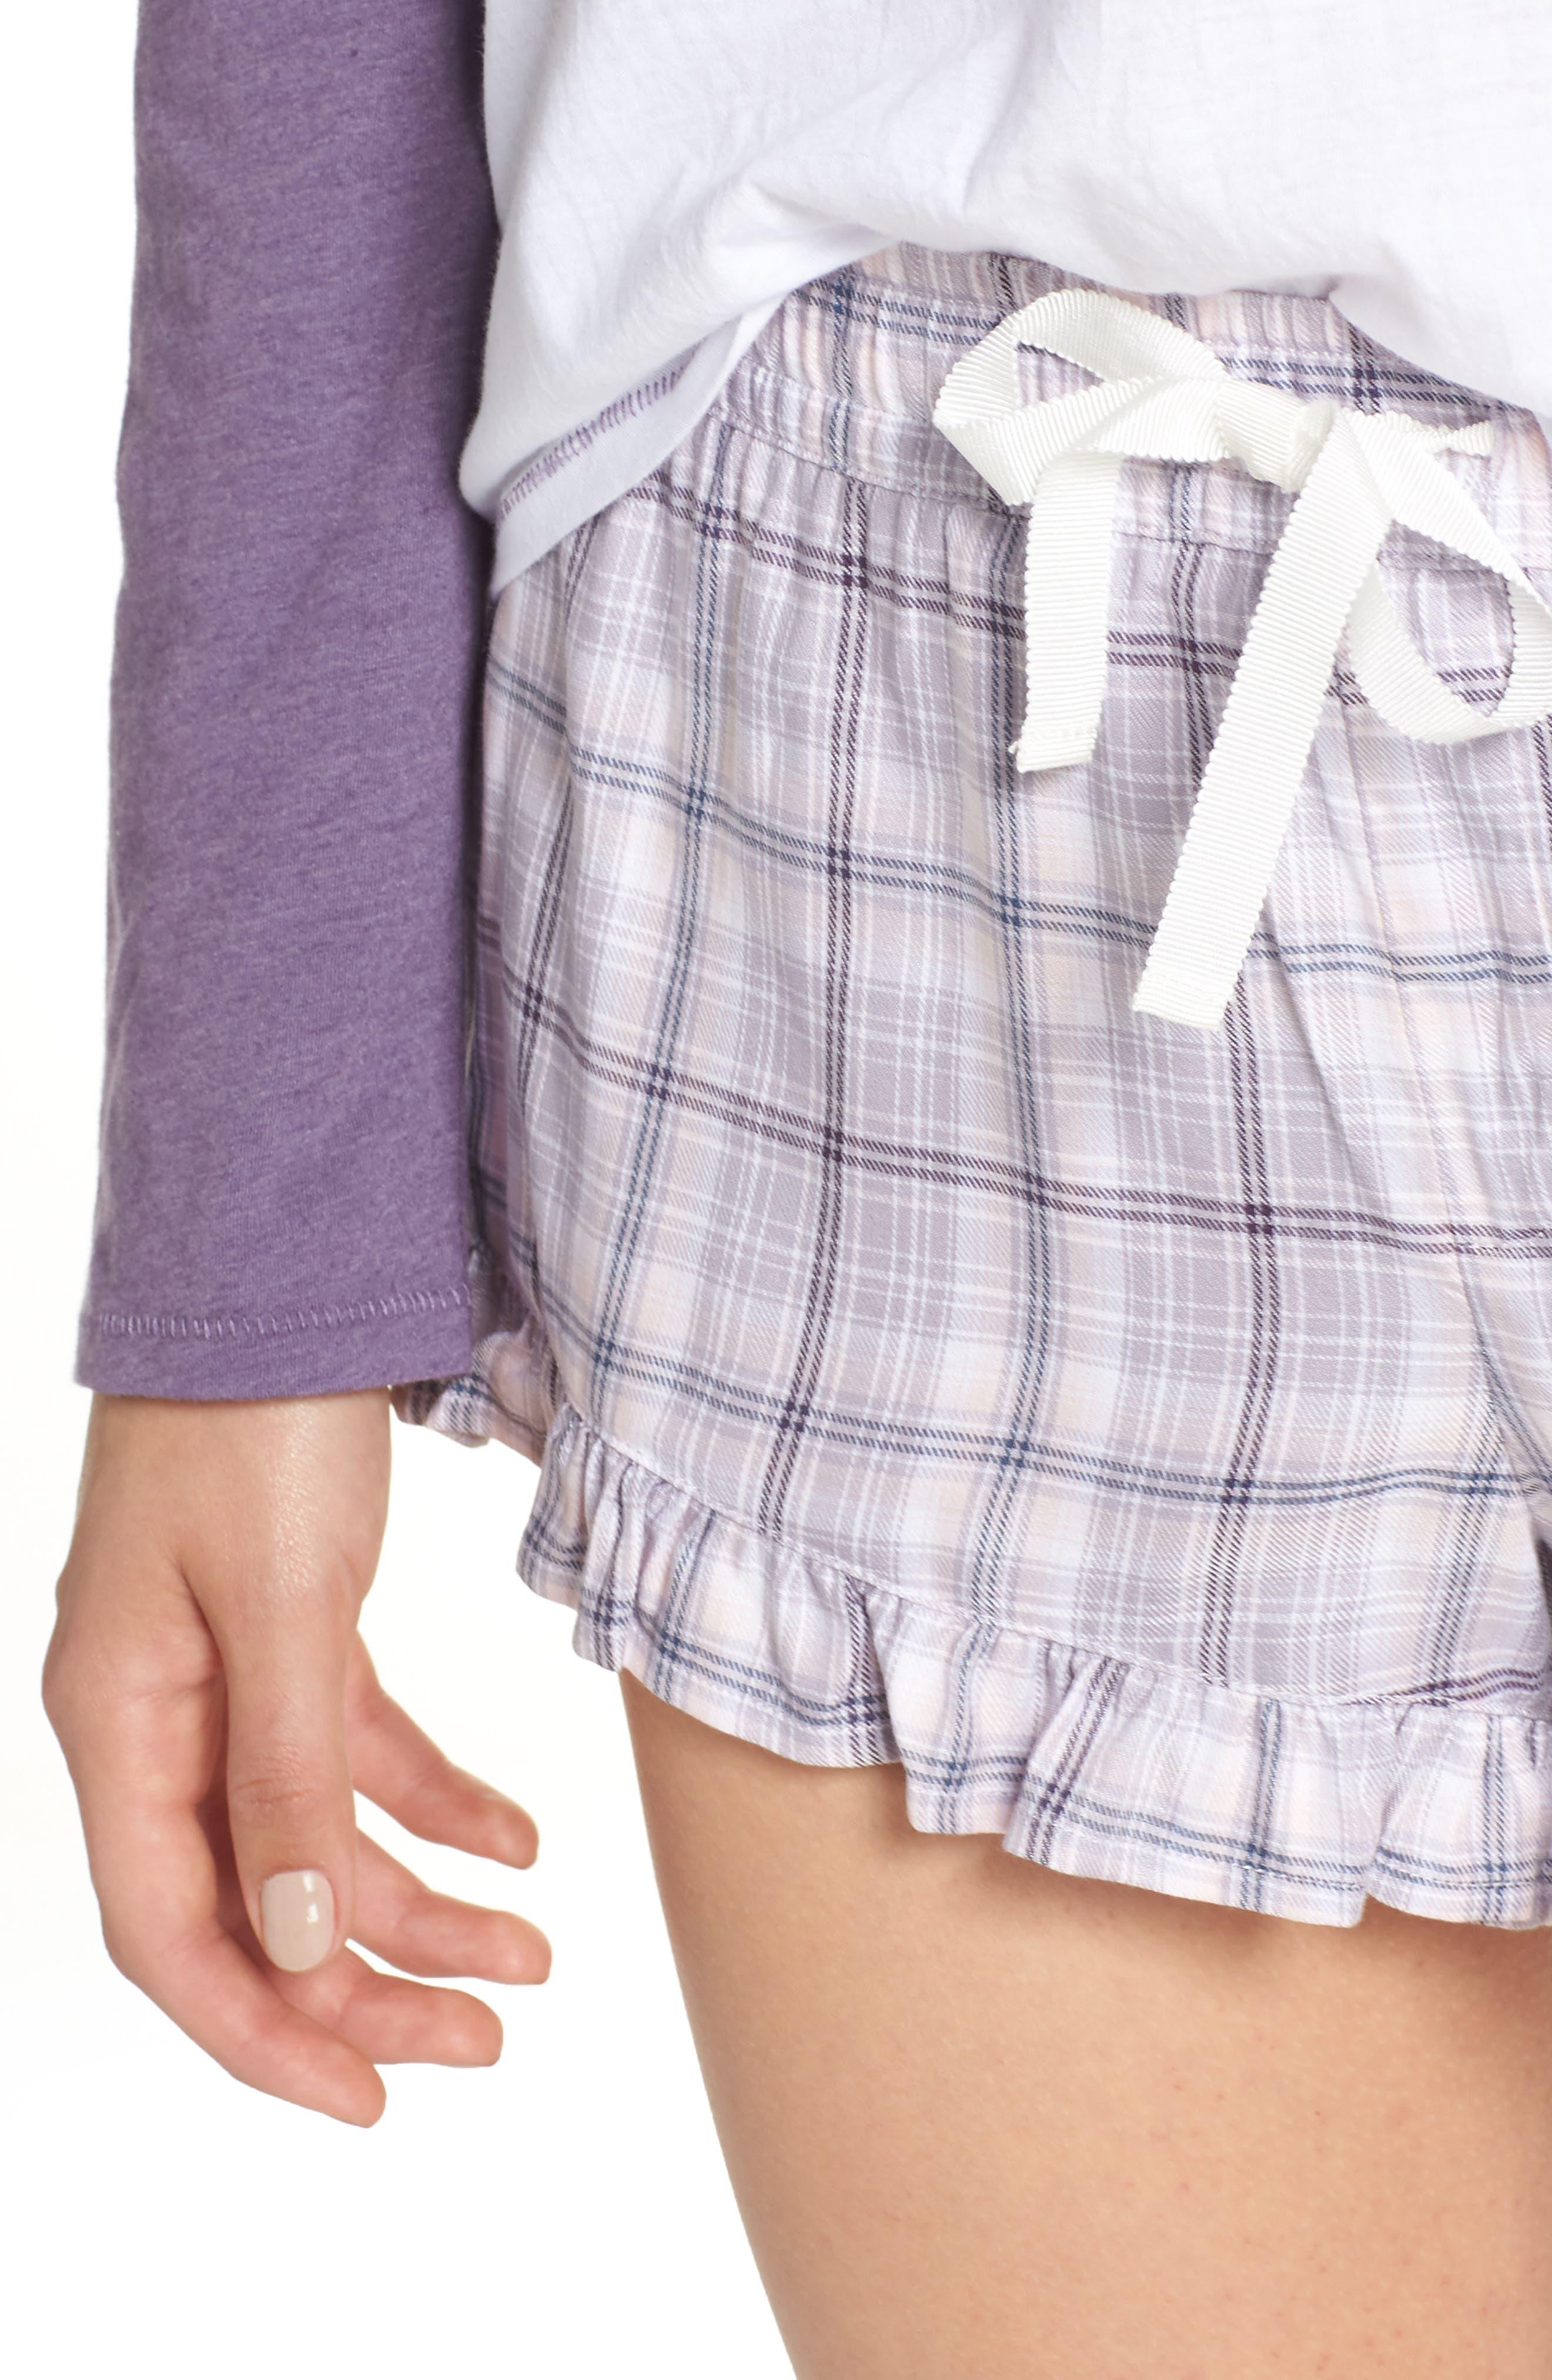 Charly Short Pajamas,                             Alternate thumbnail 4, color,                             LAVENDER AURA PLAID